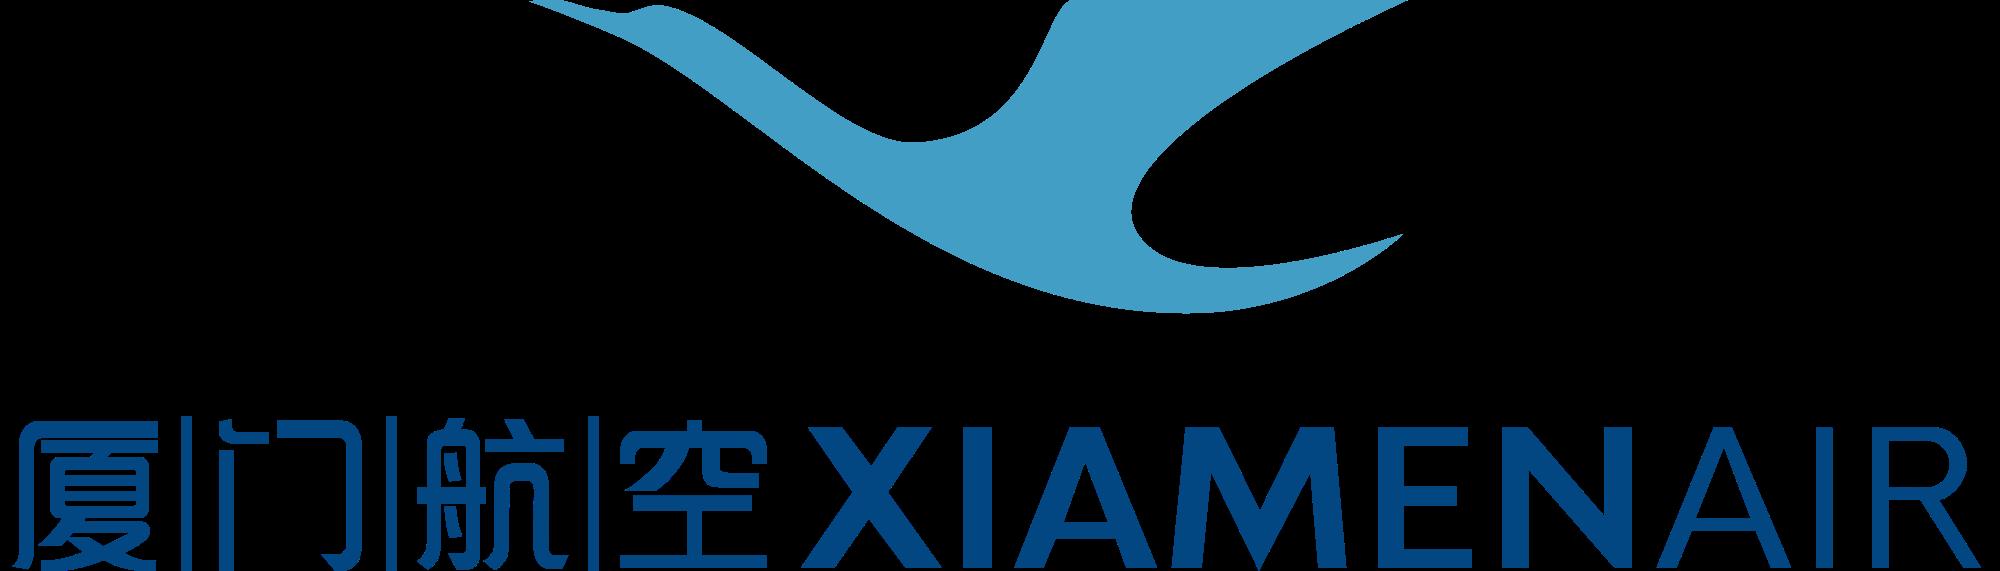 XIAMENAIR_logo.svg